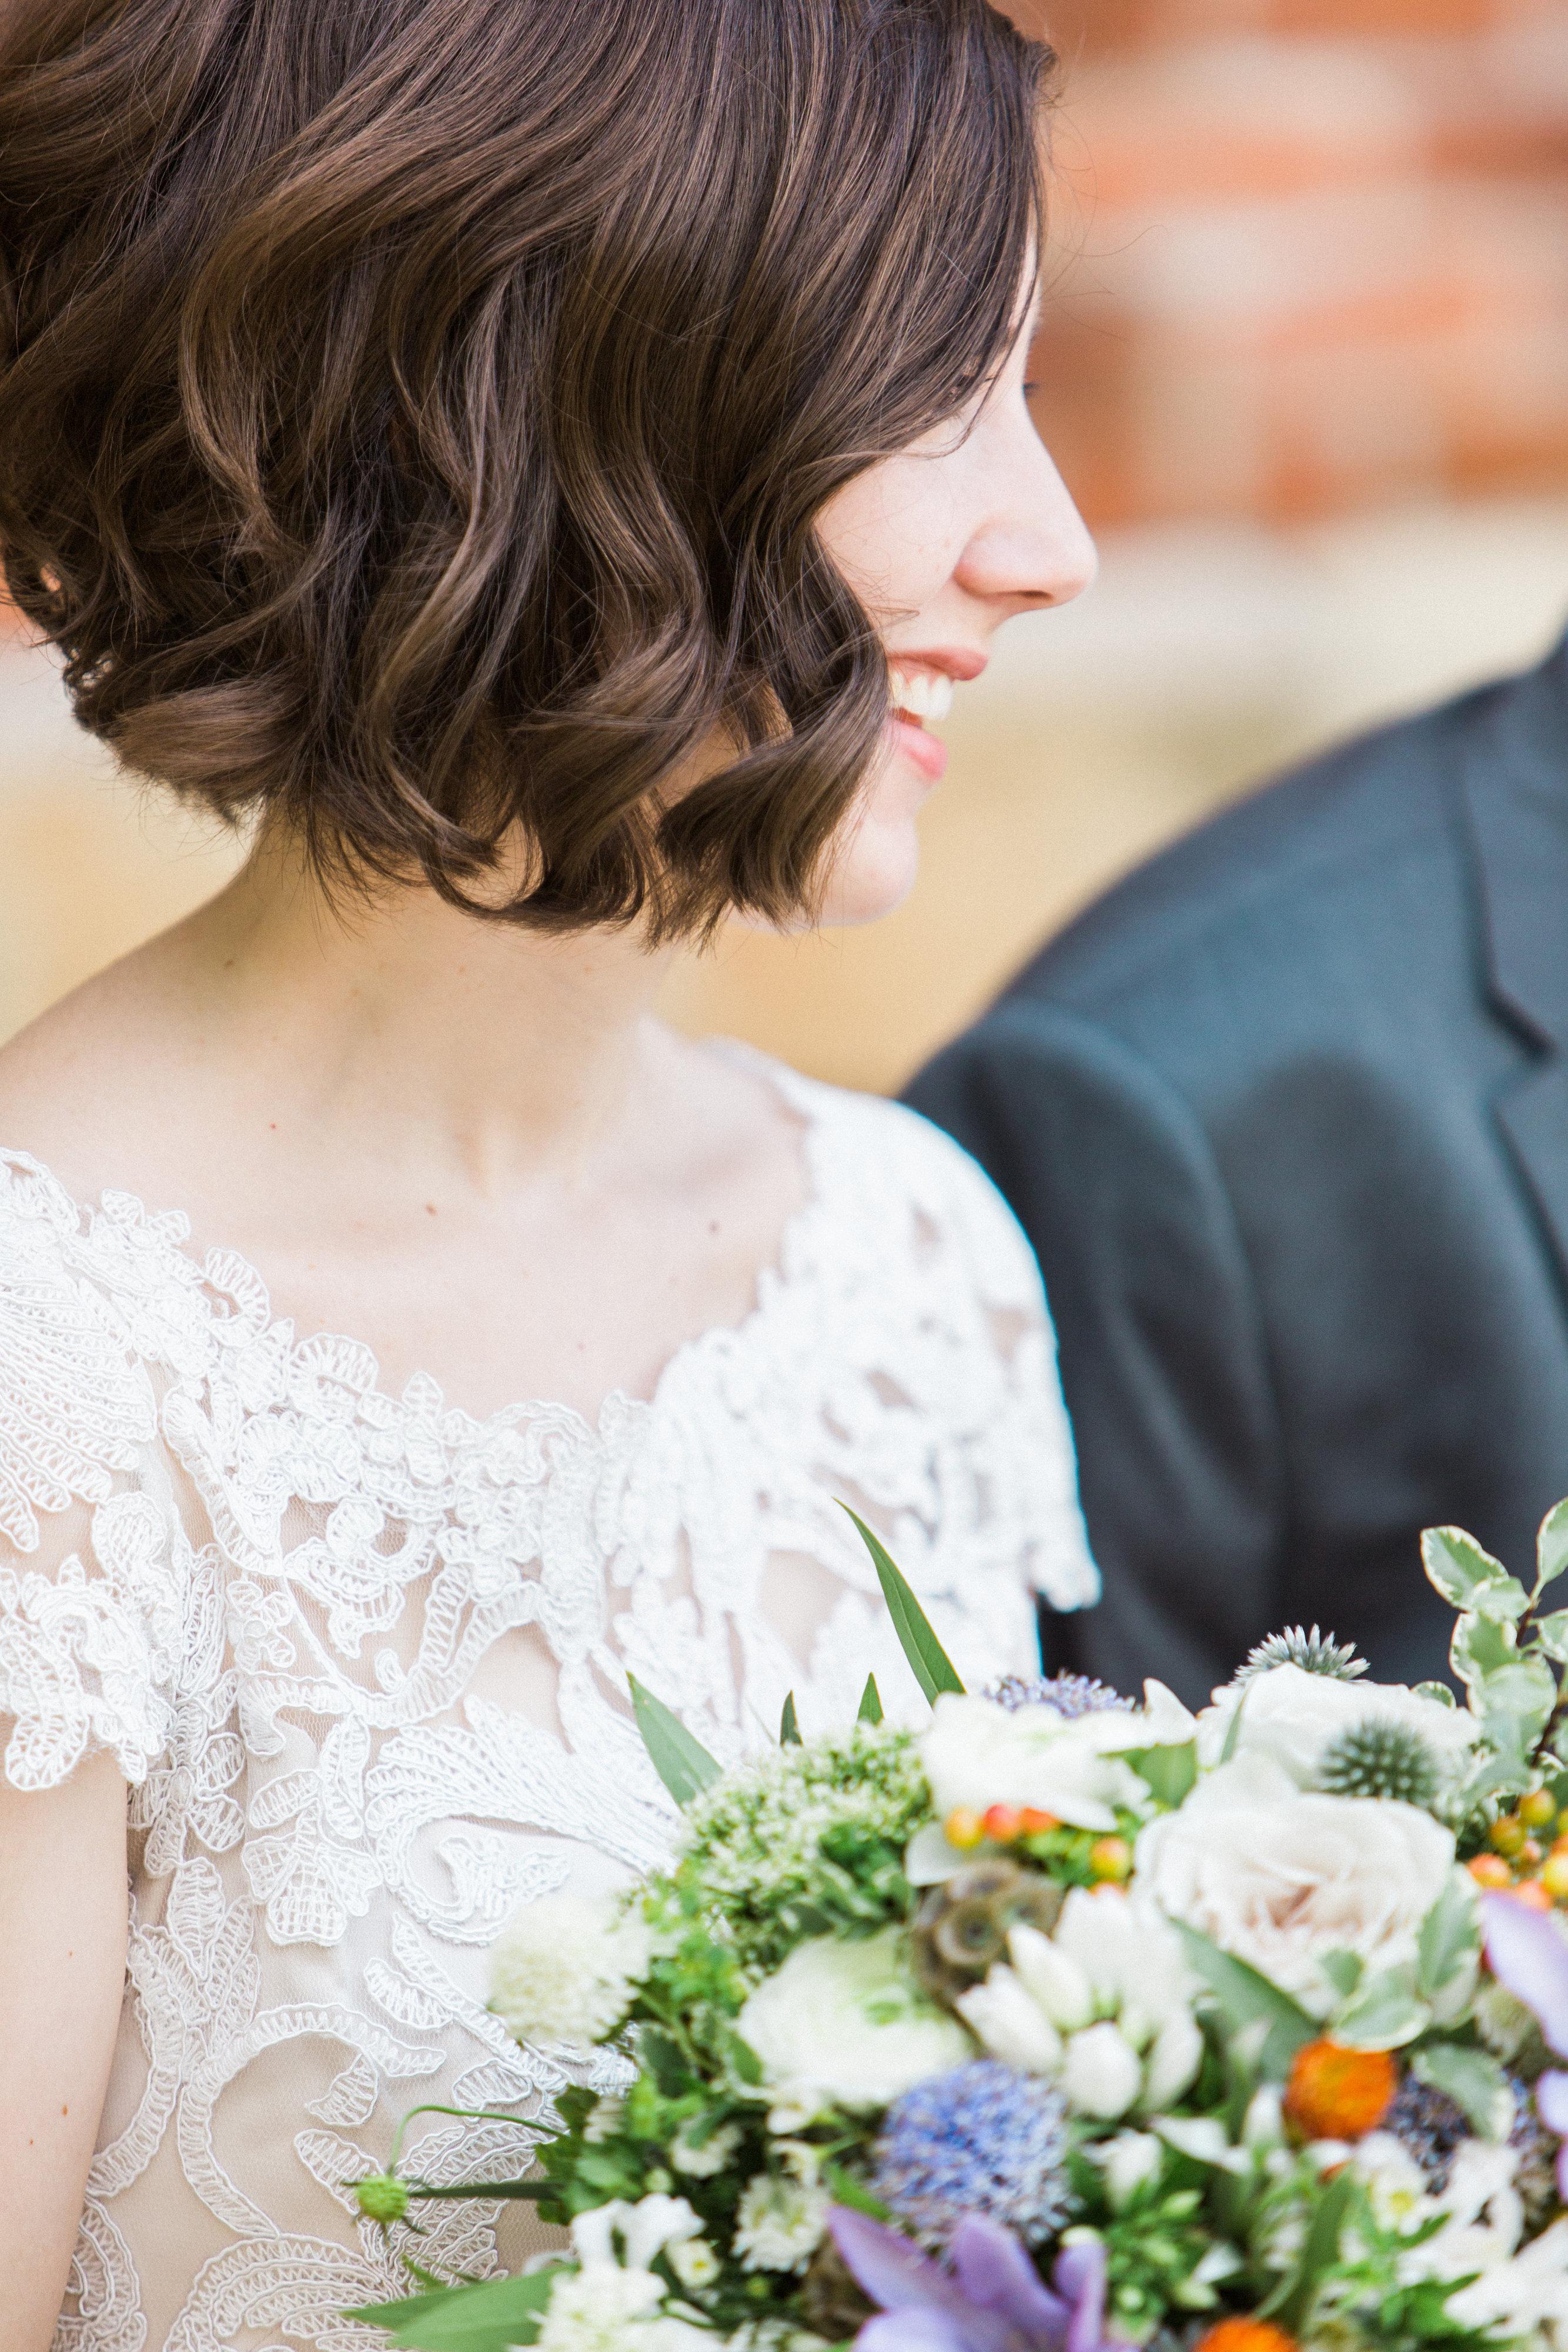 Kids Camp Transformed into a Wedding Venue - Effortless Events